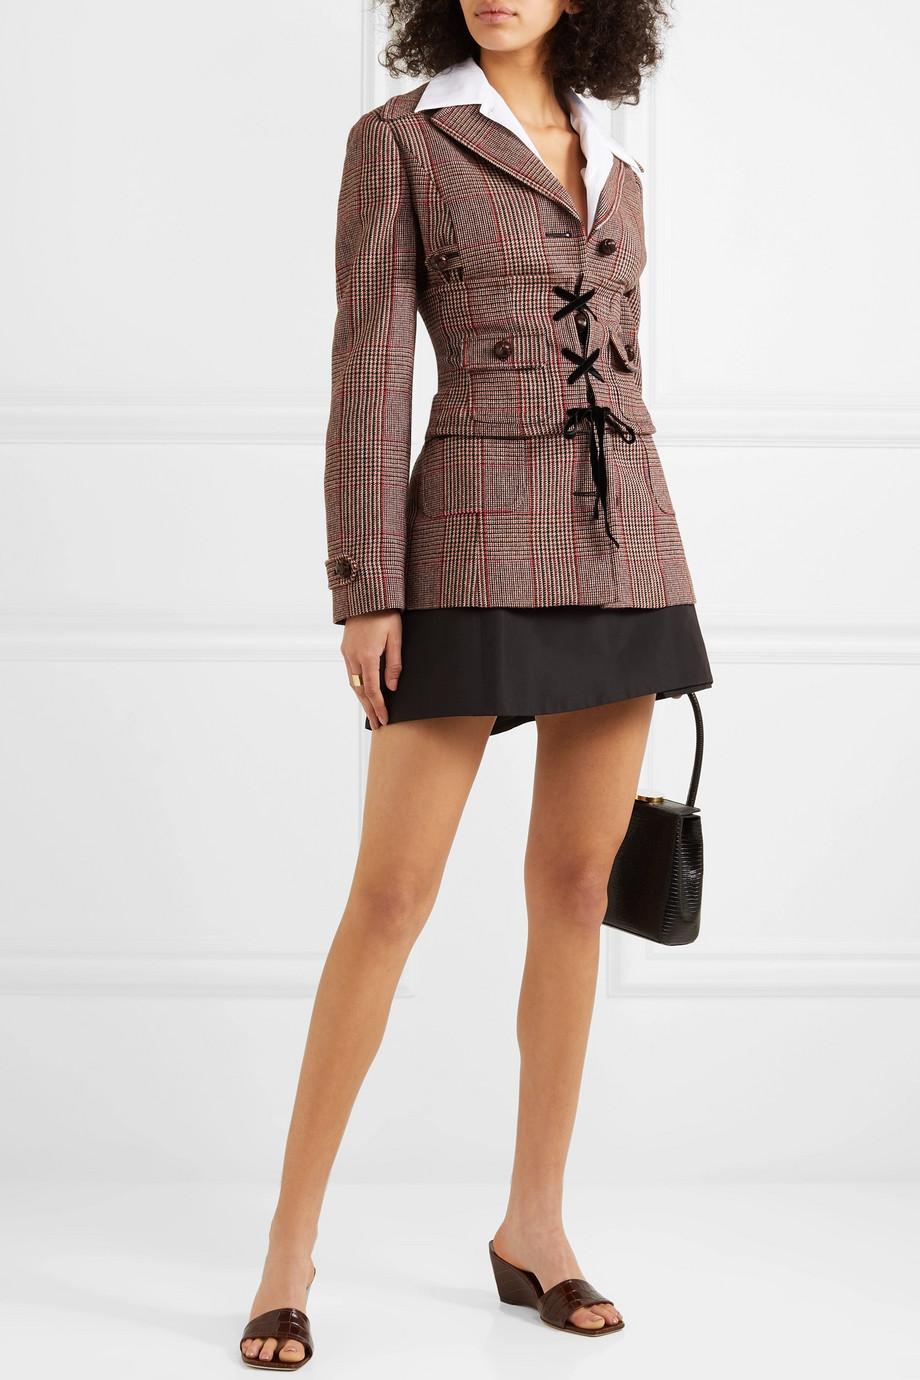 Miu Miu Belted Prince of Wales checked wool-blend blazer